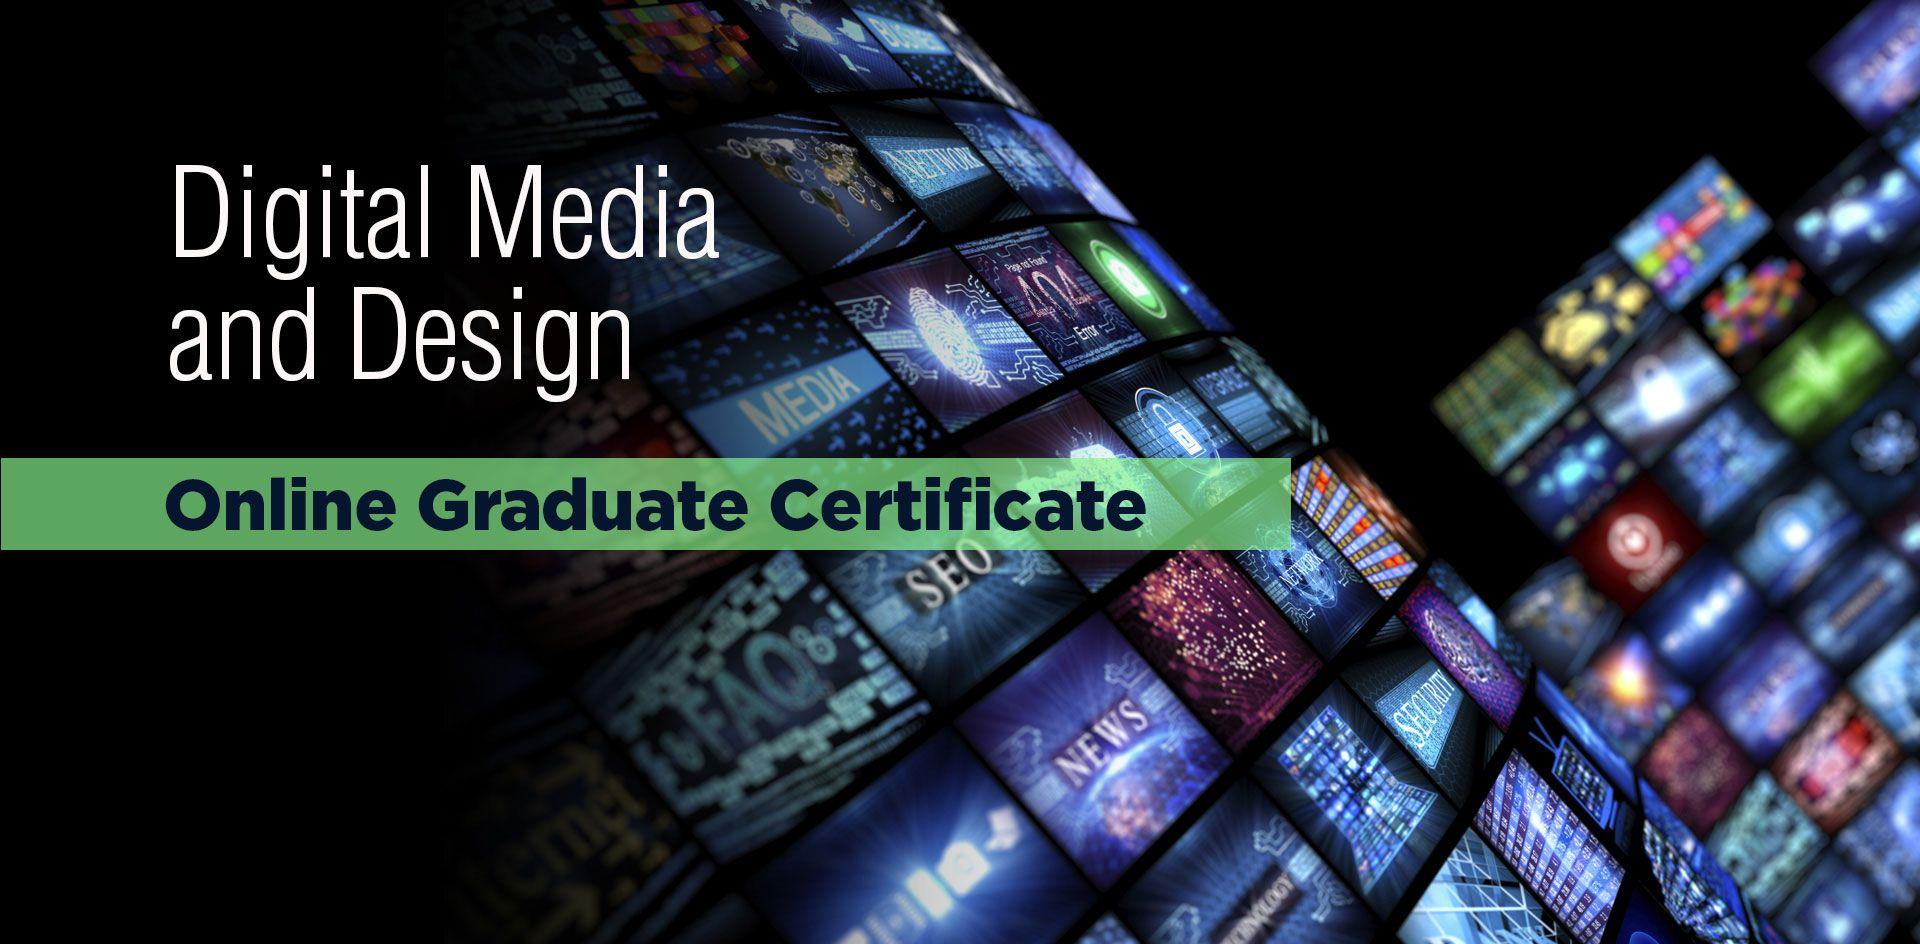 UCONN Digital Media & Design Best nursing schools